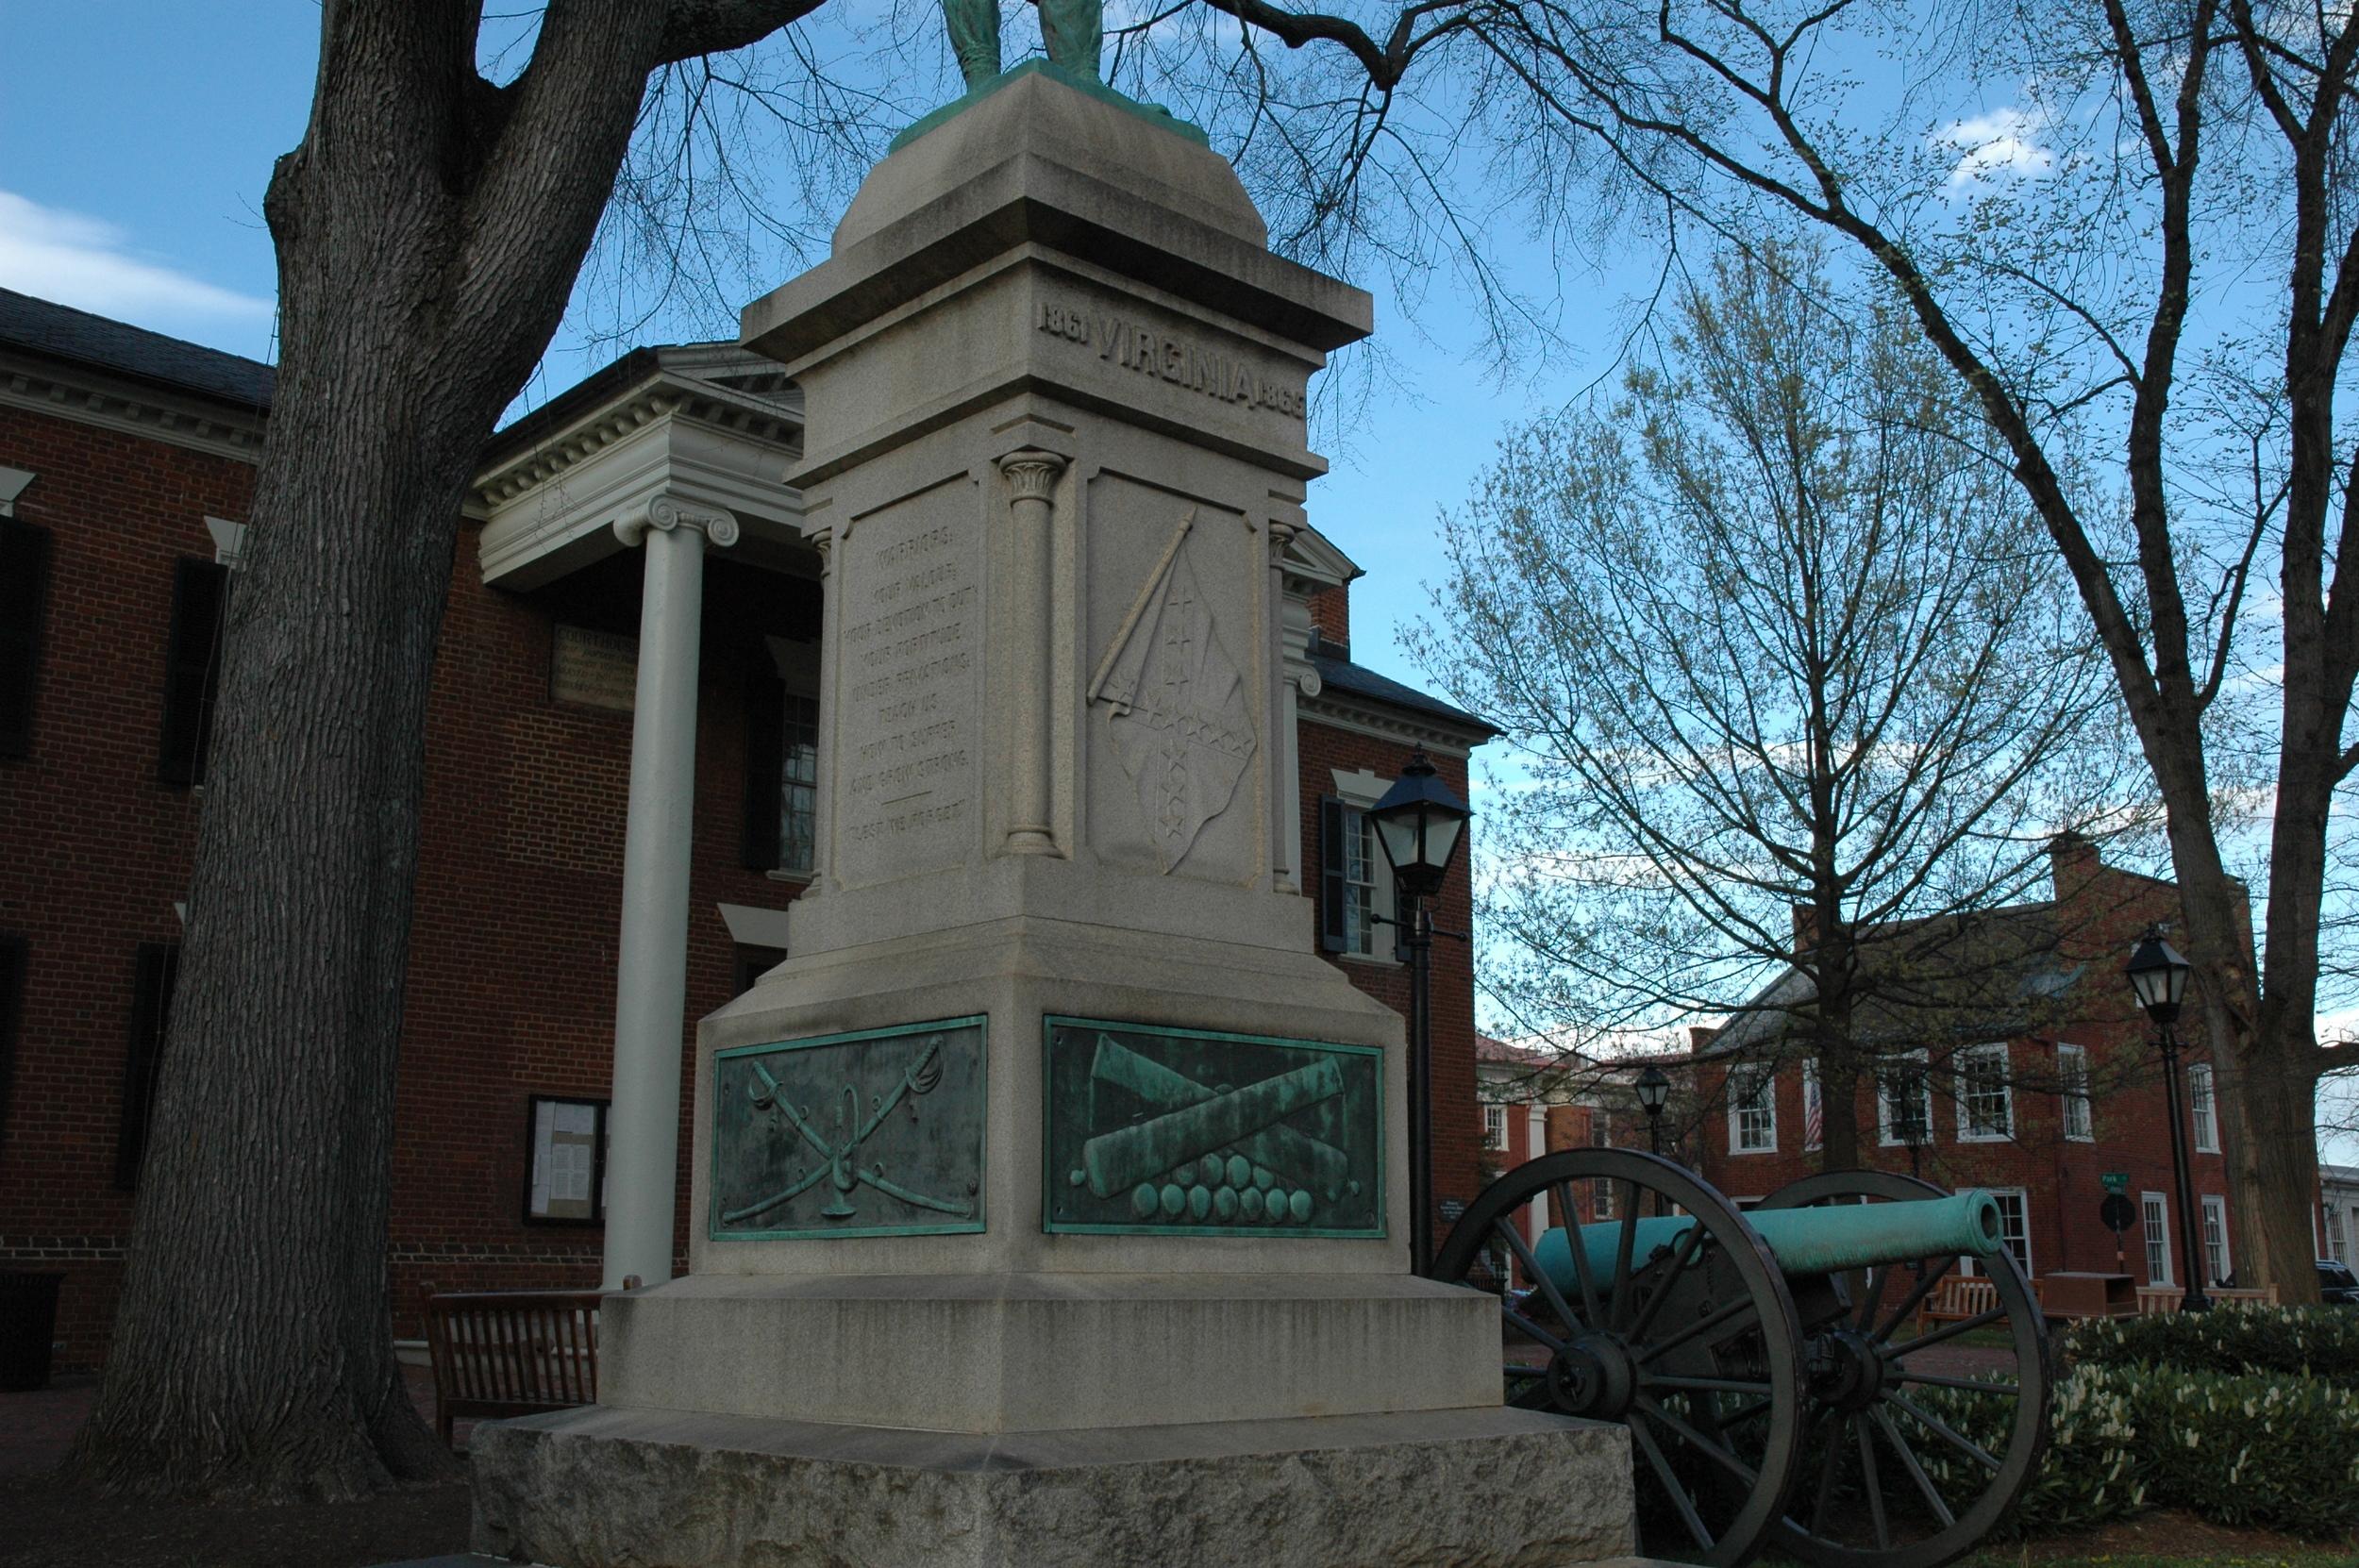 Charlottesville Canon Monument Court Square Statue.JPG